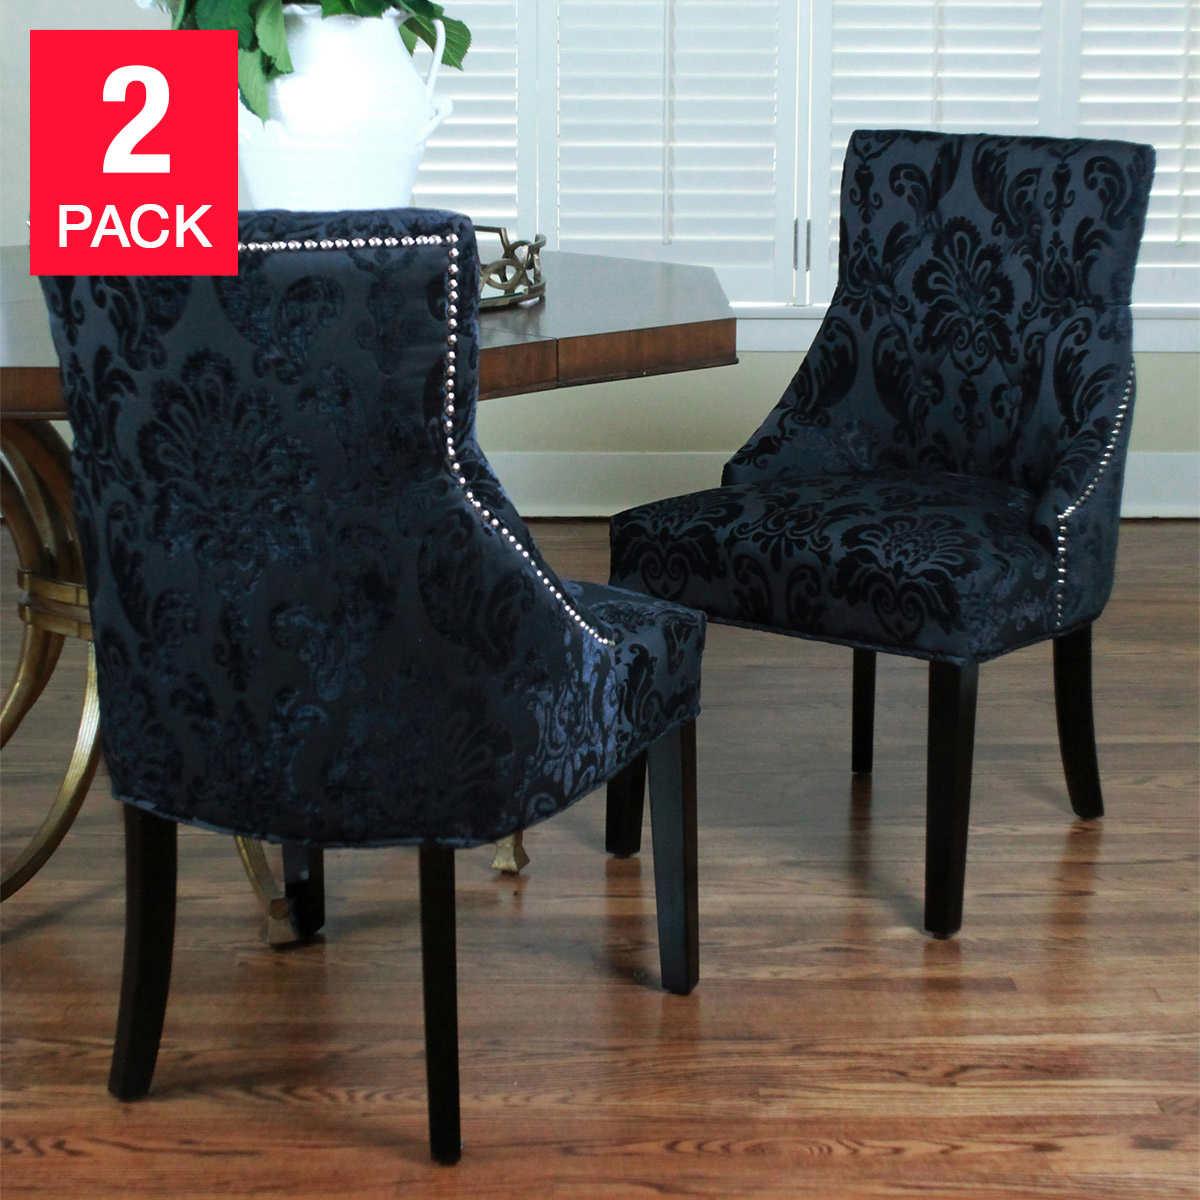 Orange damask chair - Madison Black Fan Damask Chair 2 Pack